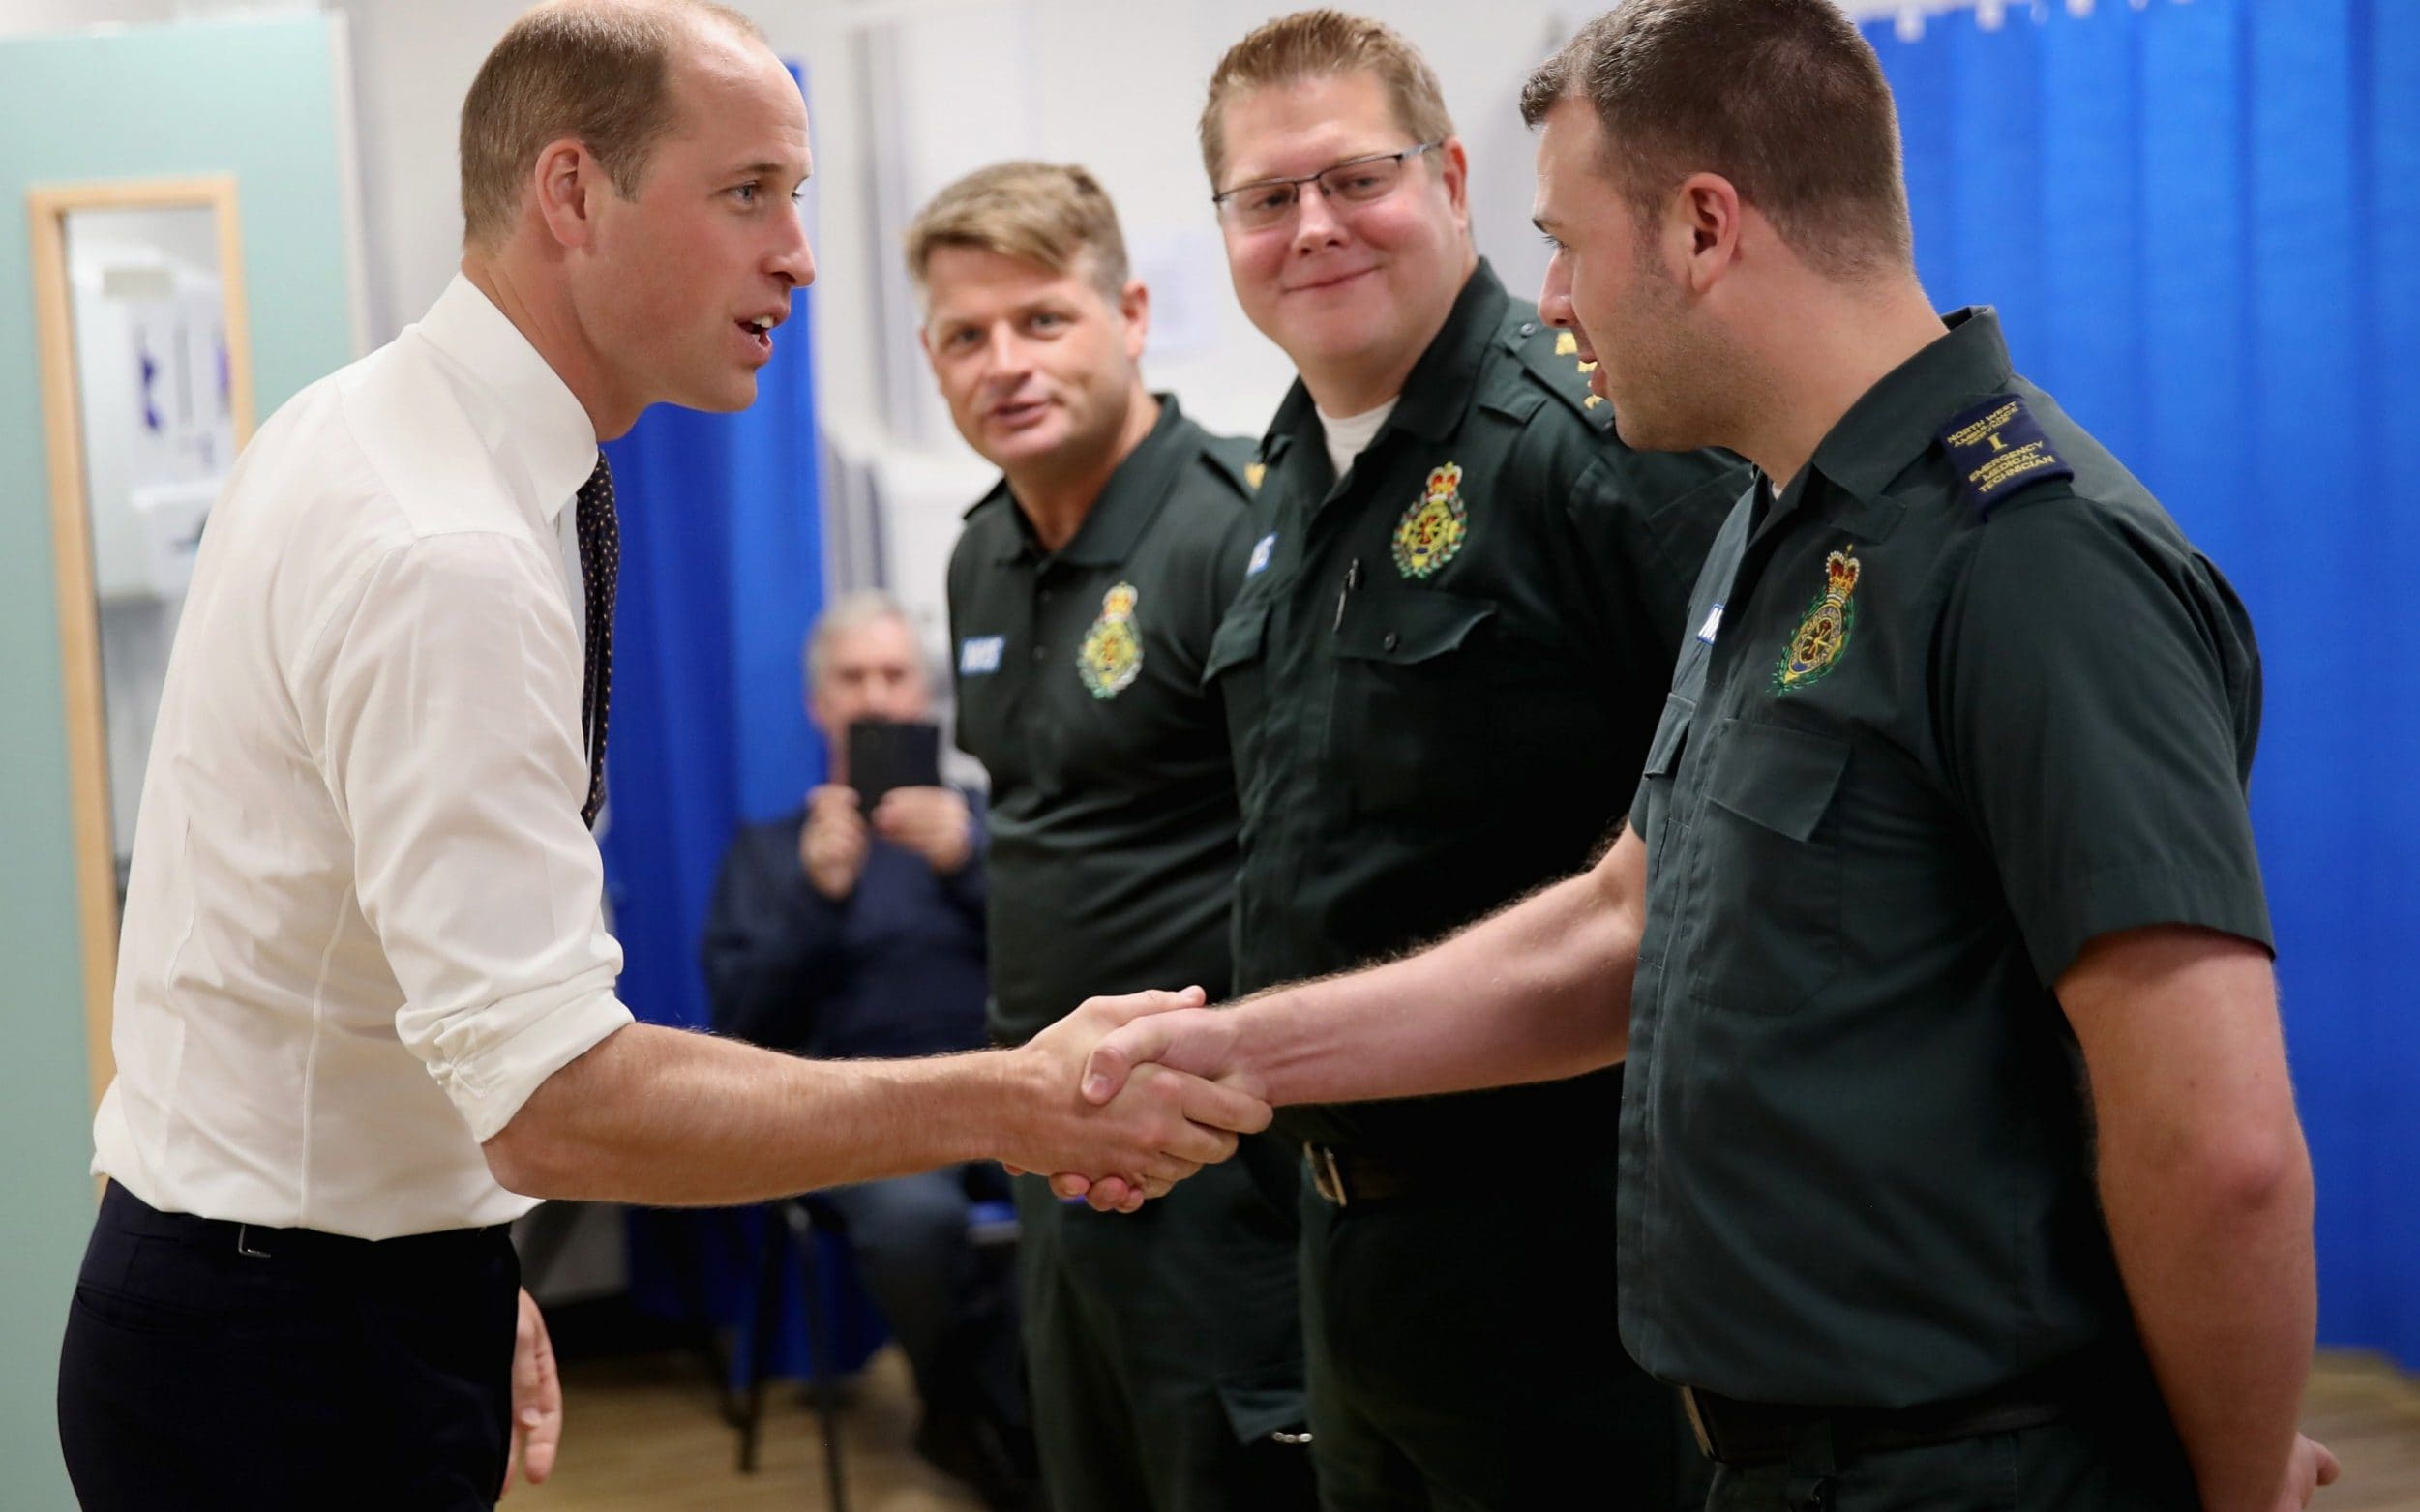 Prince William, Duke of Cambridge meets hospital staff